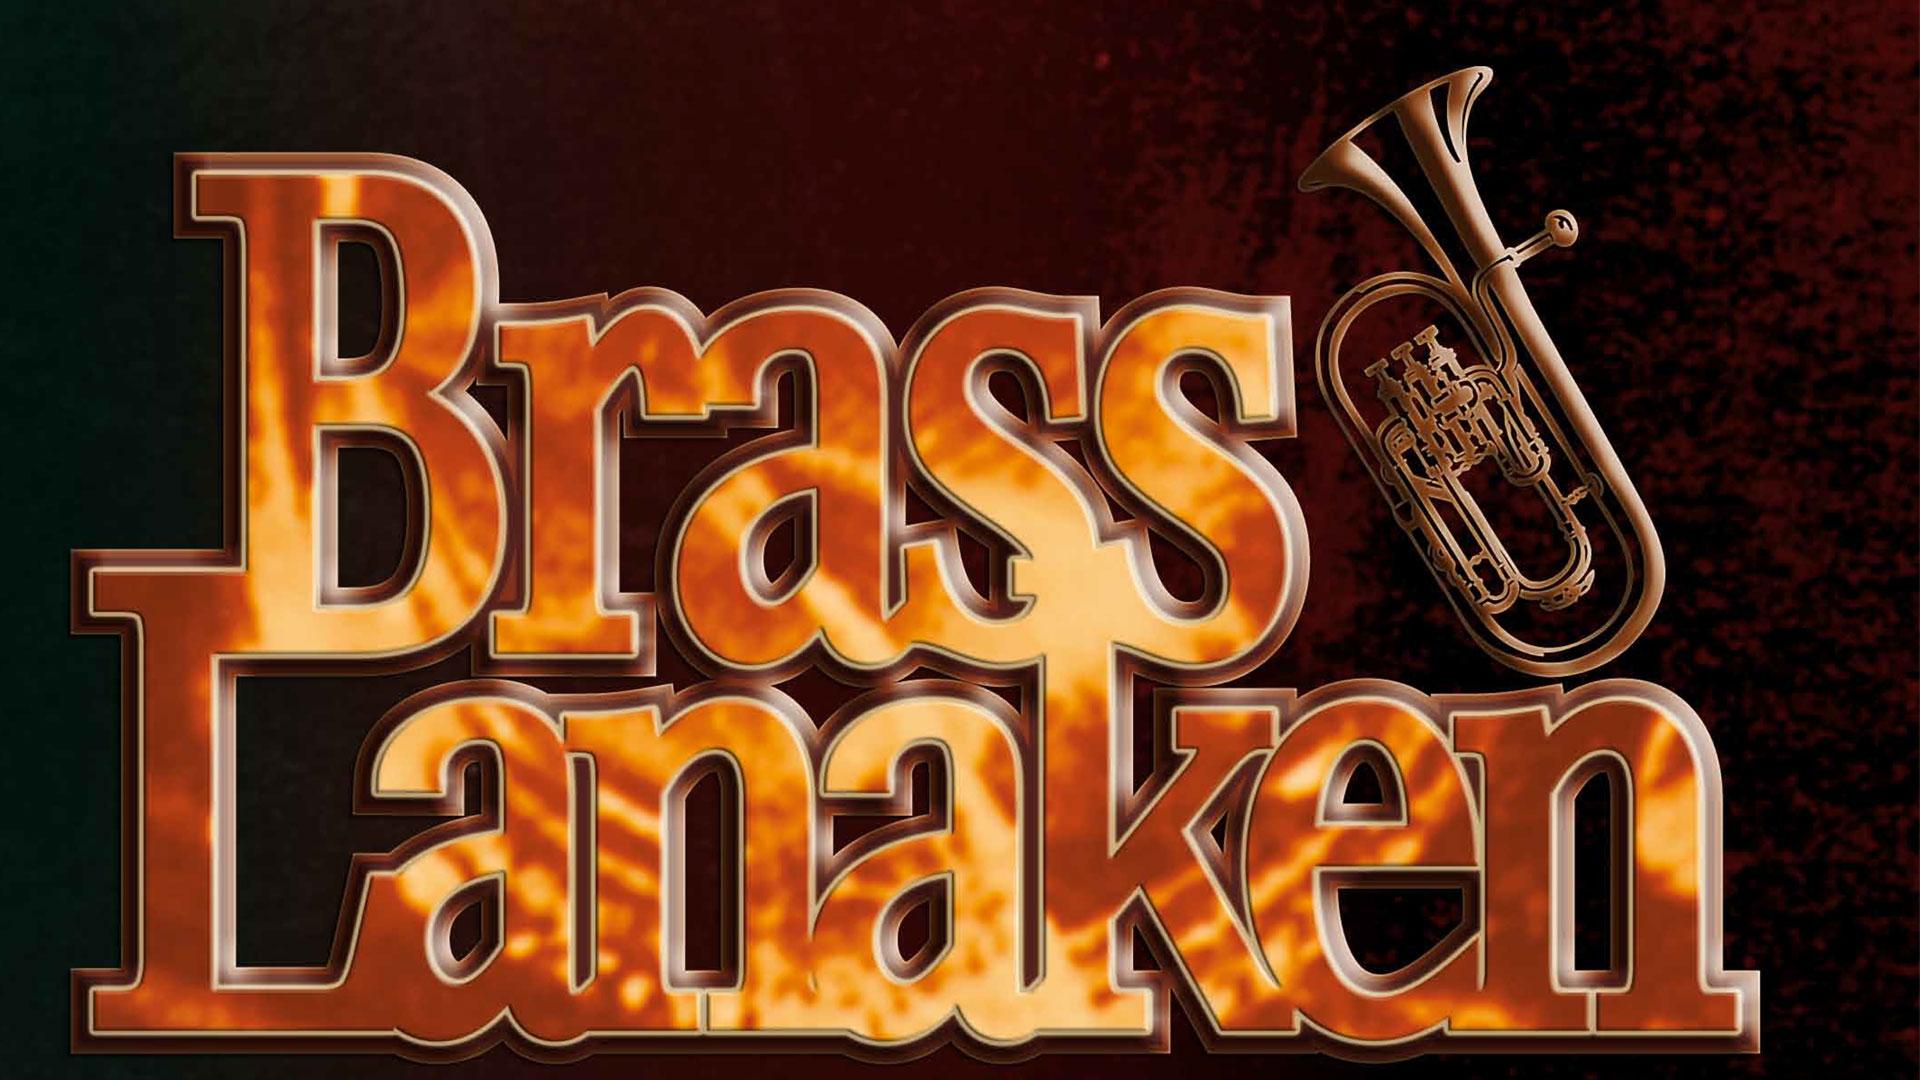 Brass Lanaken